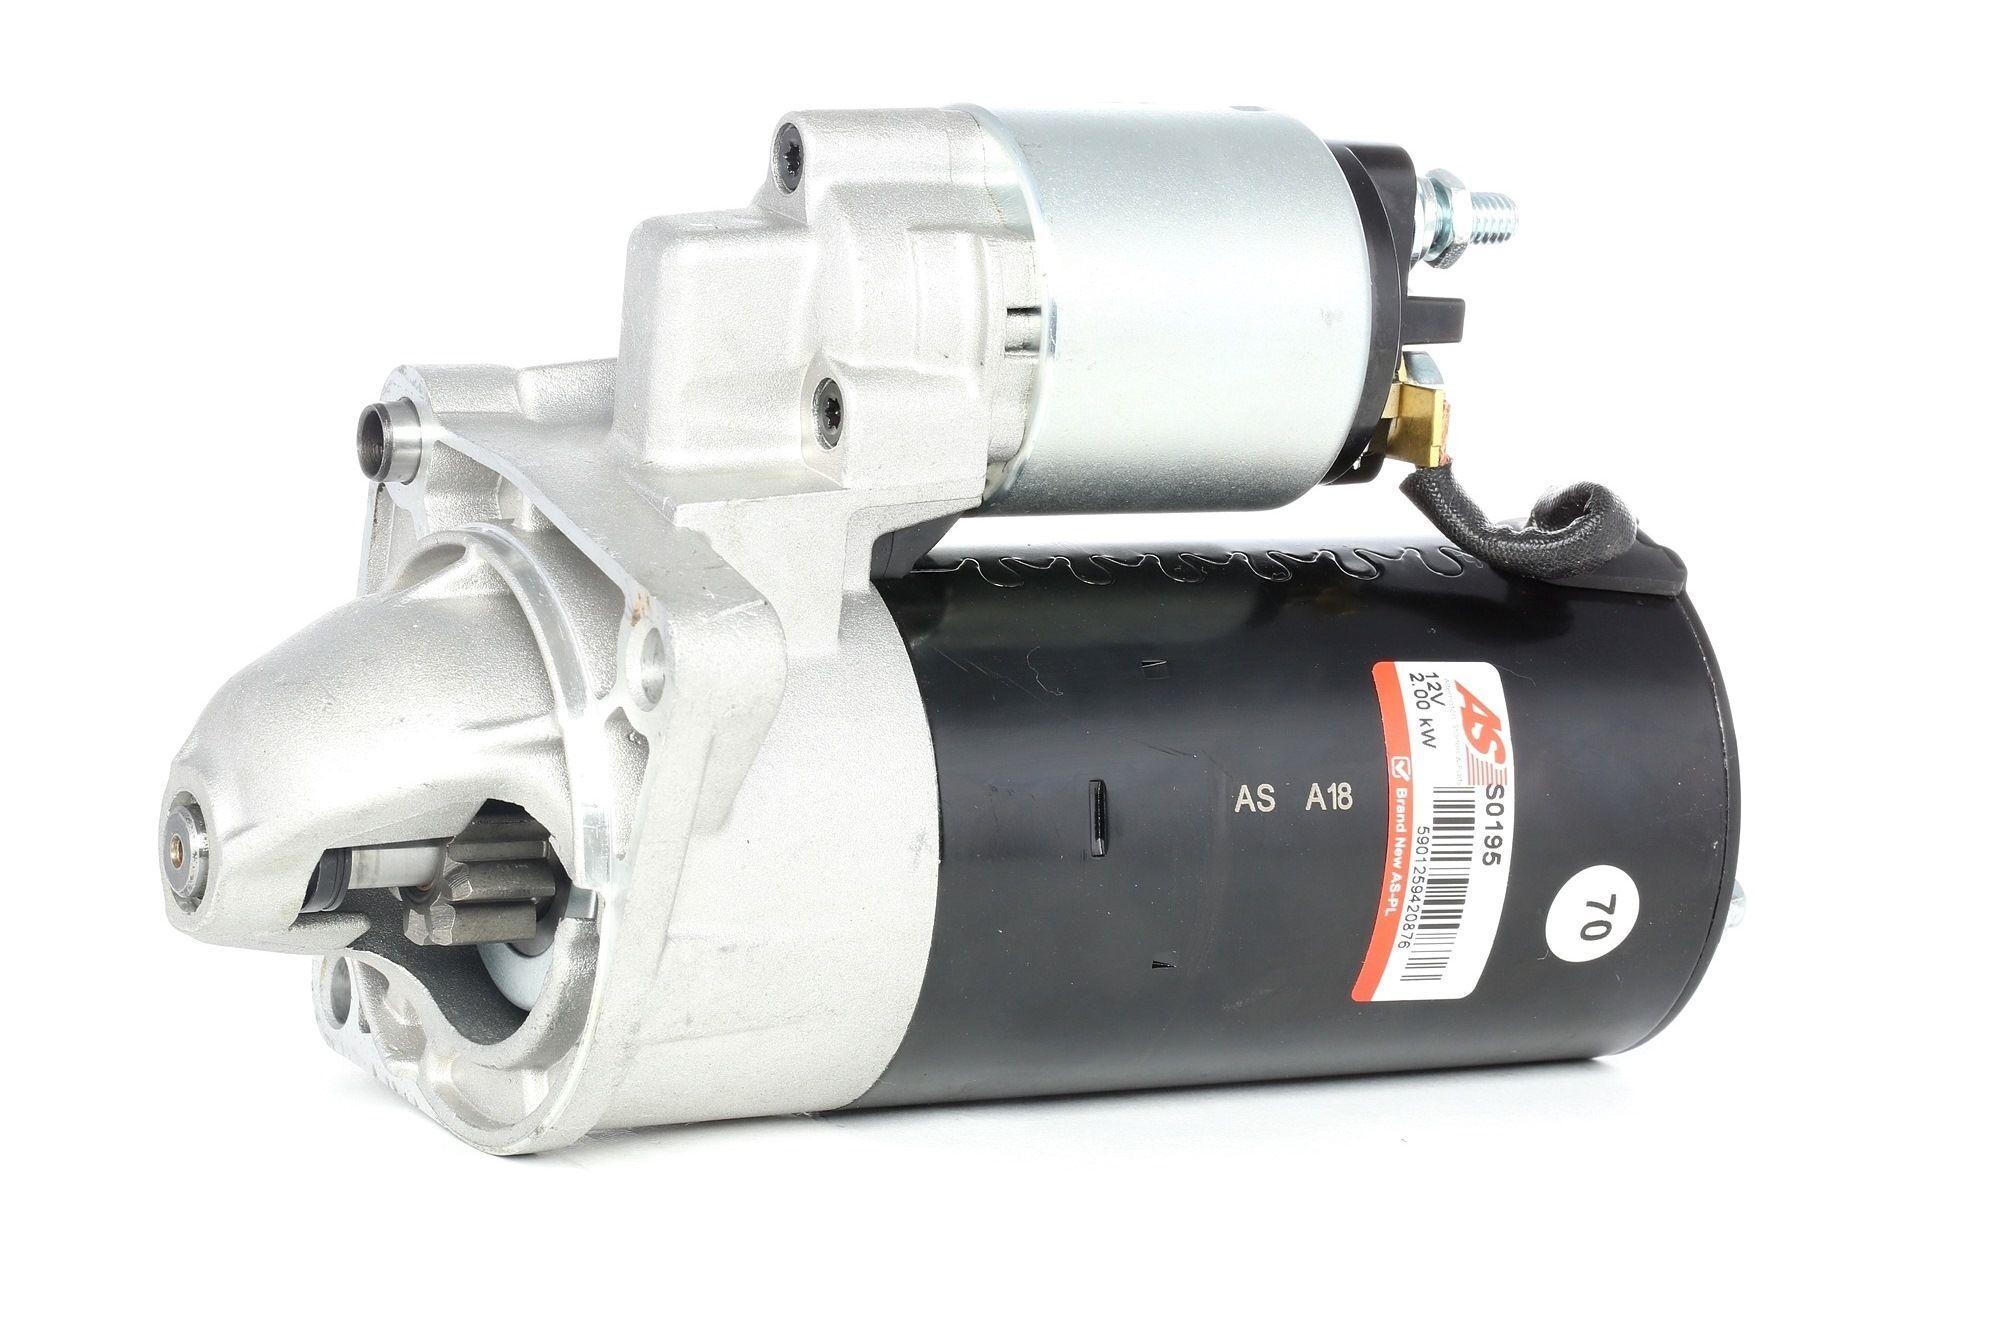 AS-PL Starttimoottori Brand new AS-PL Starter motor drive DISCONTINUED S0195 Startti,Käynnistinmoottori CHEVROLET,CADILLAC,SUZUKI,CRUZE J300